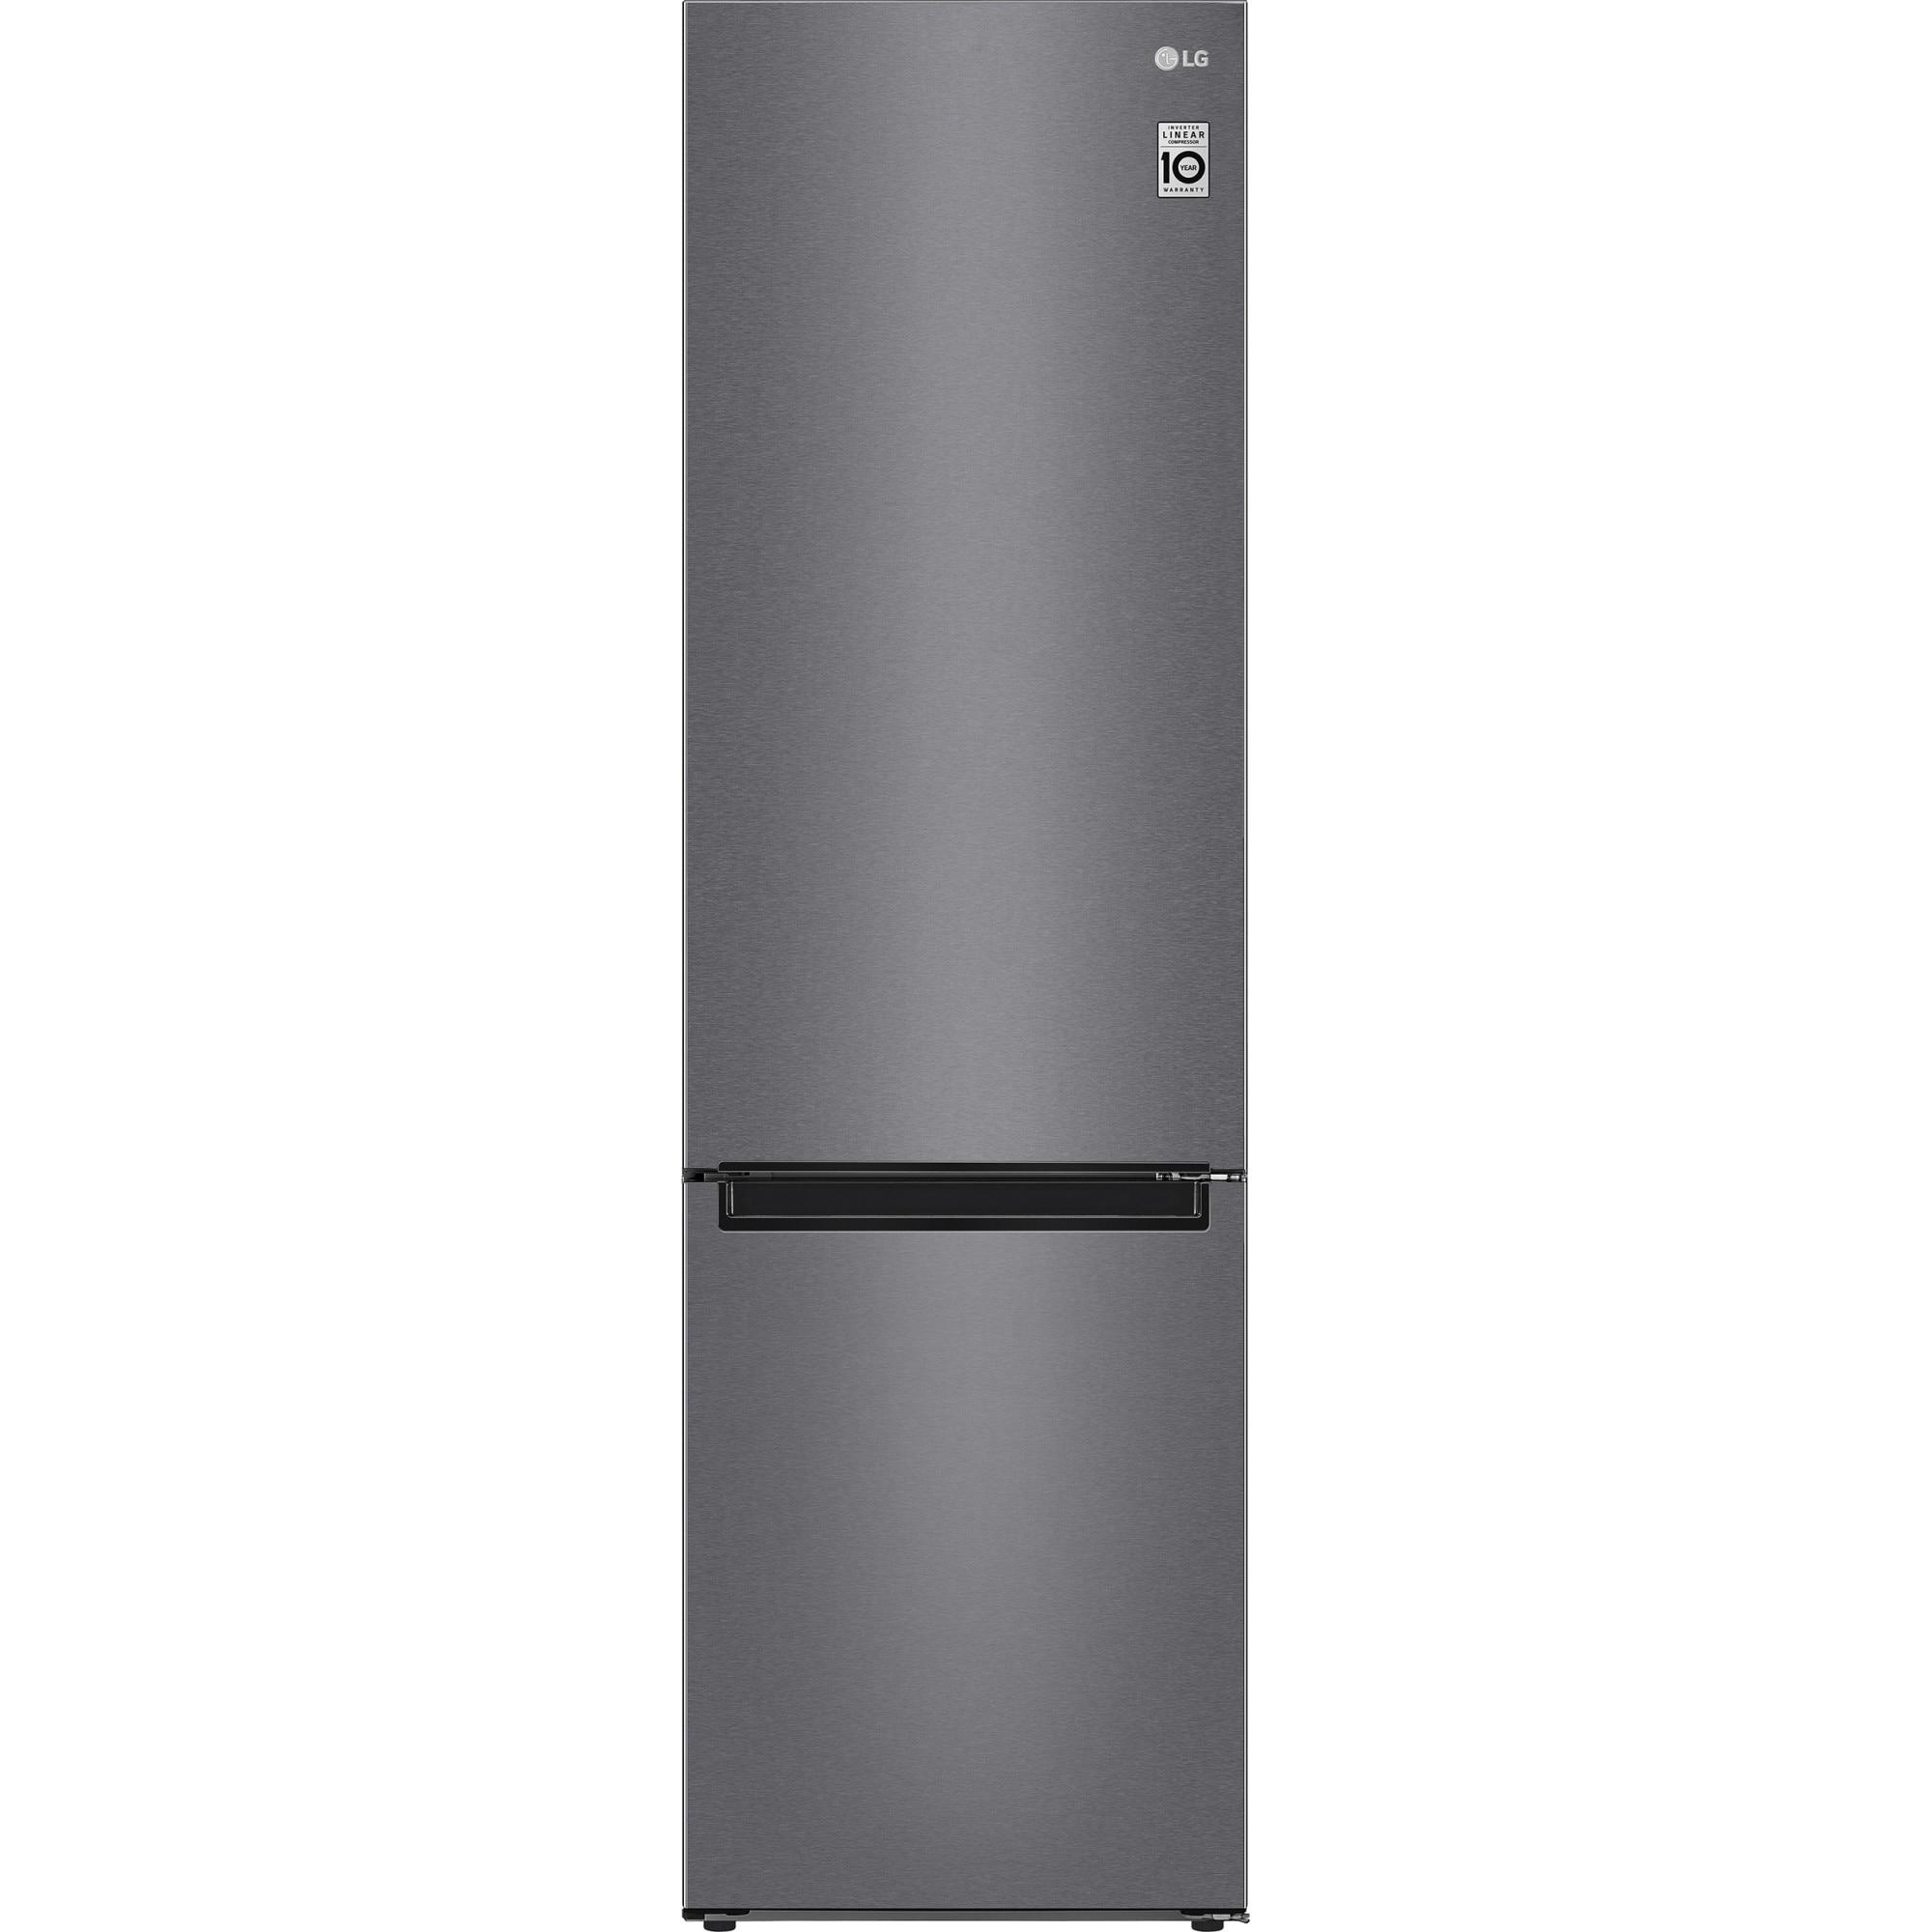 Fotografie Combina frigorifica LG GBP62DSSFR, 384 l, Clasa D, No Frost, Compresor Liniar Inverter, Display, Antracit